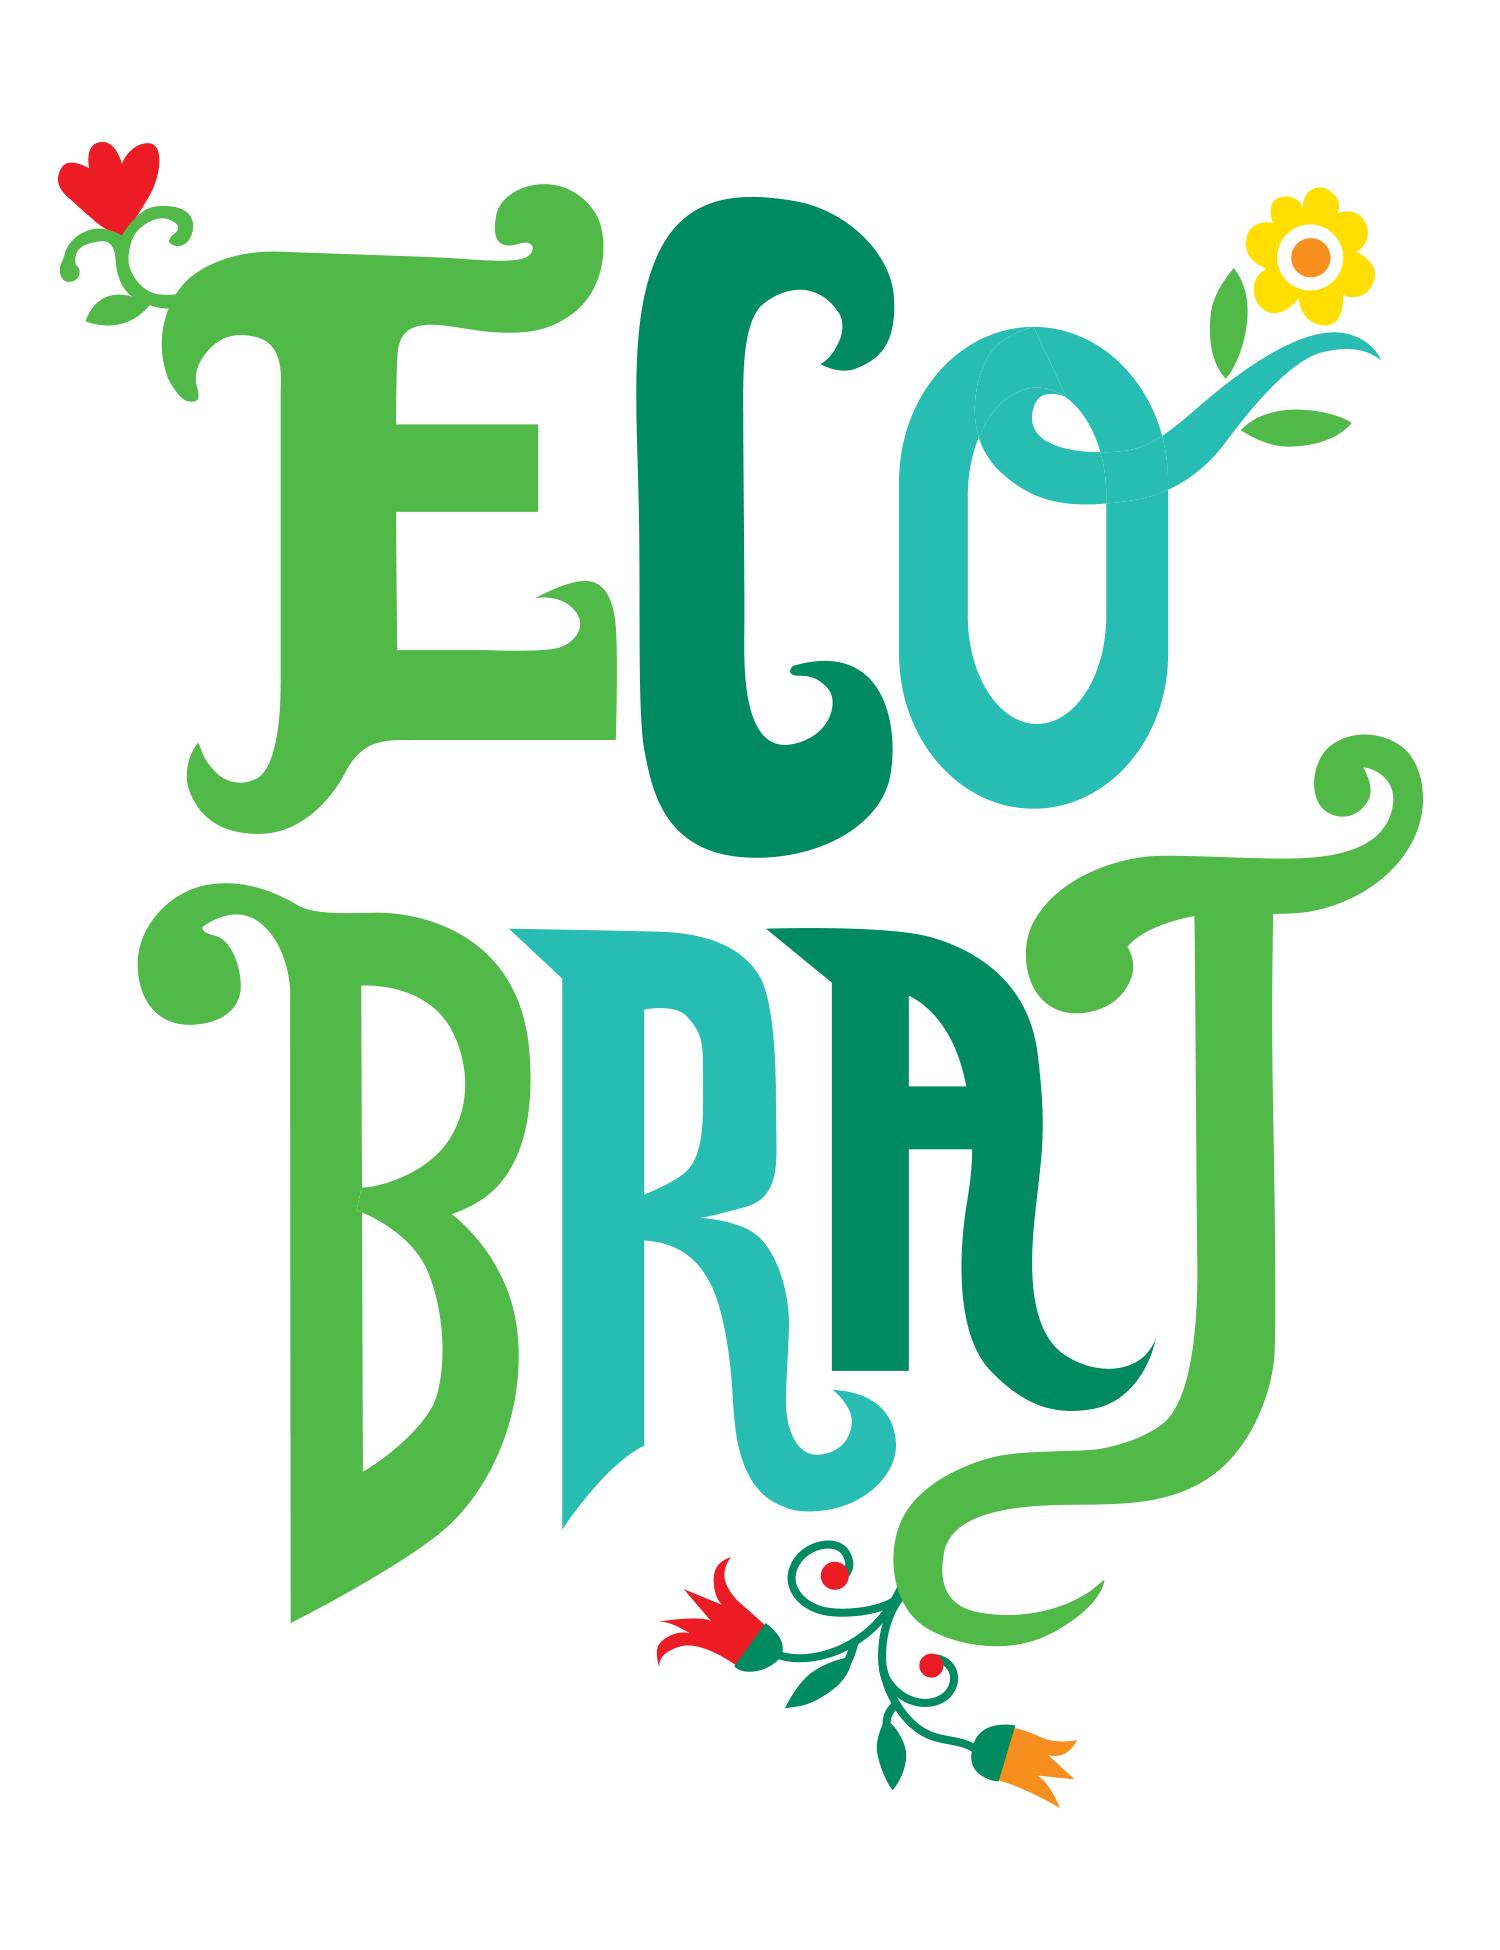 eco_brat_type_andi_bird.png